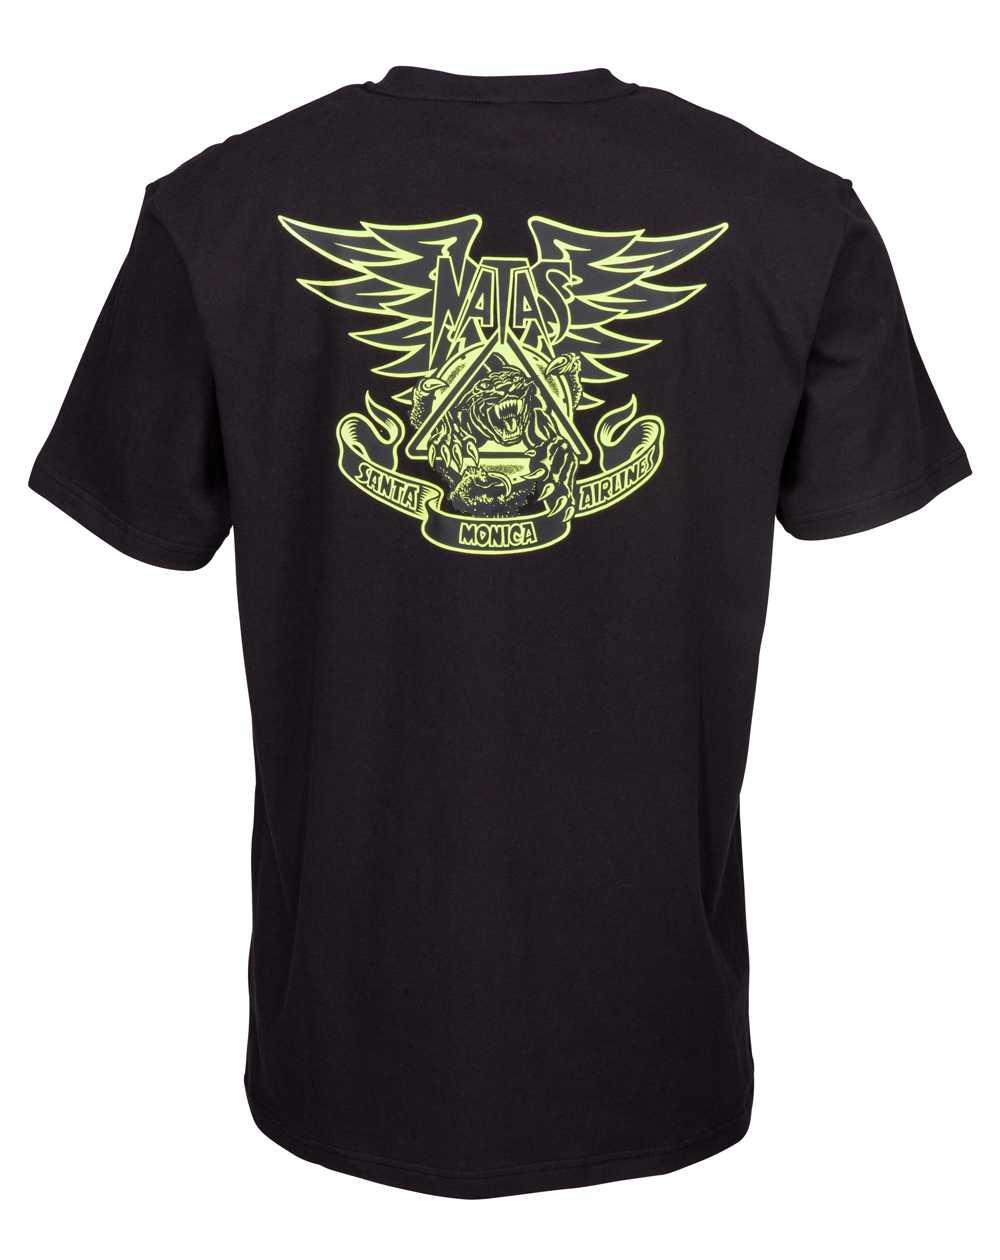 Santa Cruz Men's T-Shirt Natas Panther Black